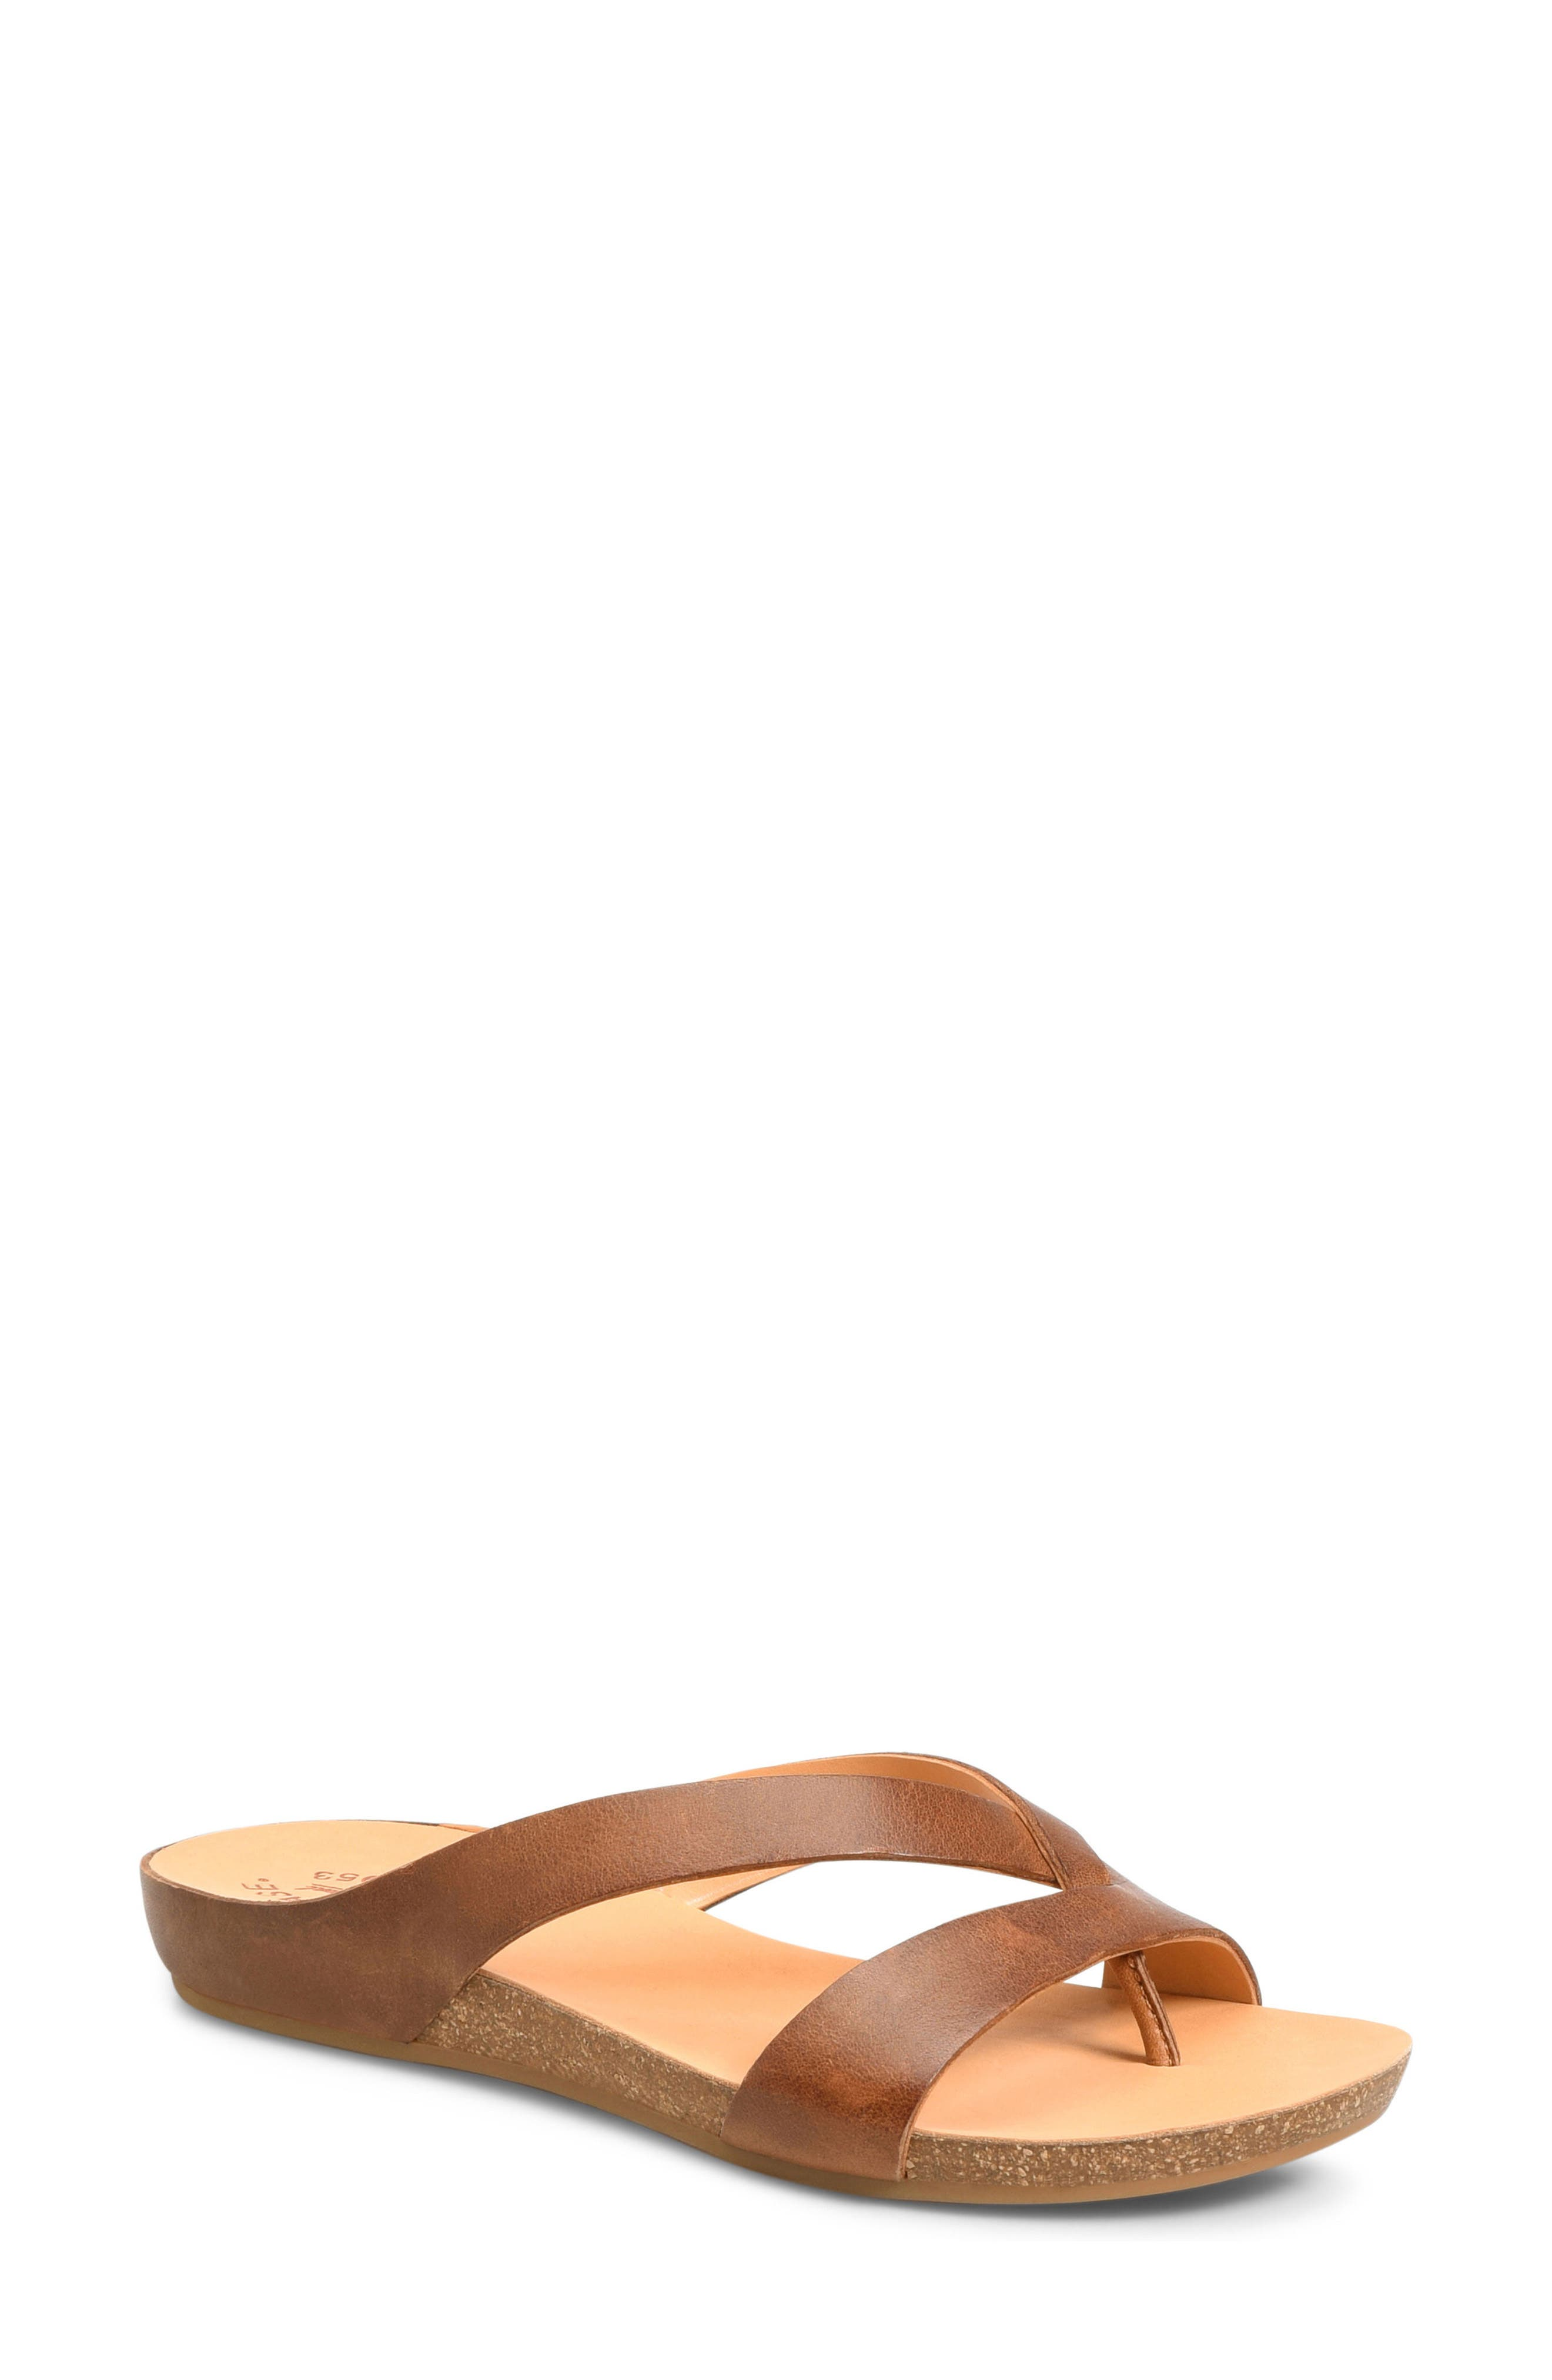 Devoe Sandal,                         Main,                         color, Brown Leather